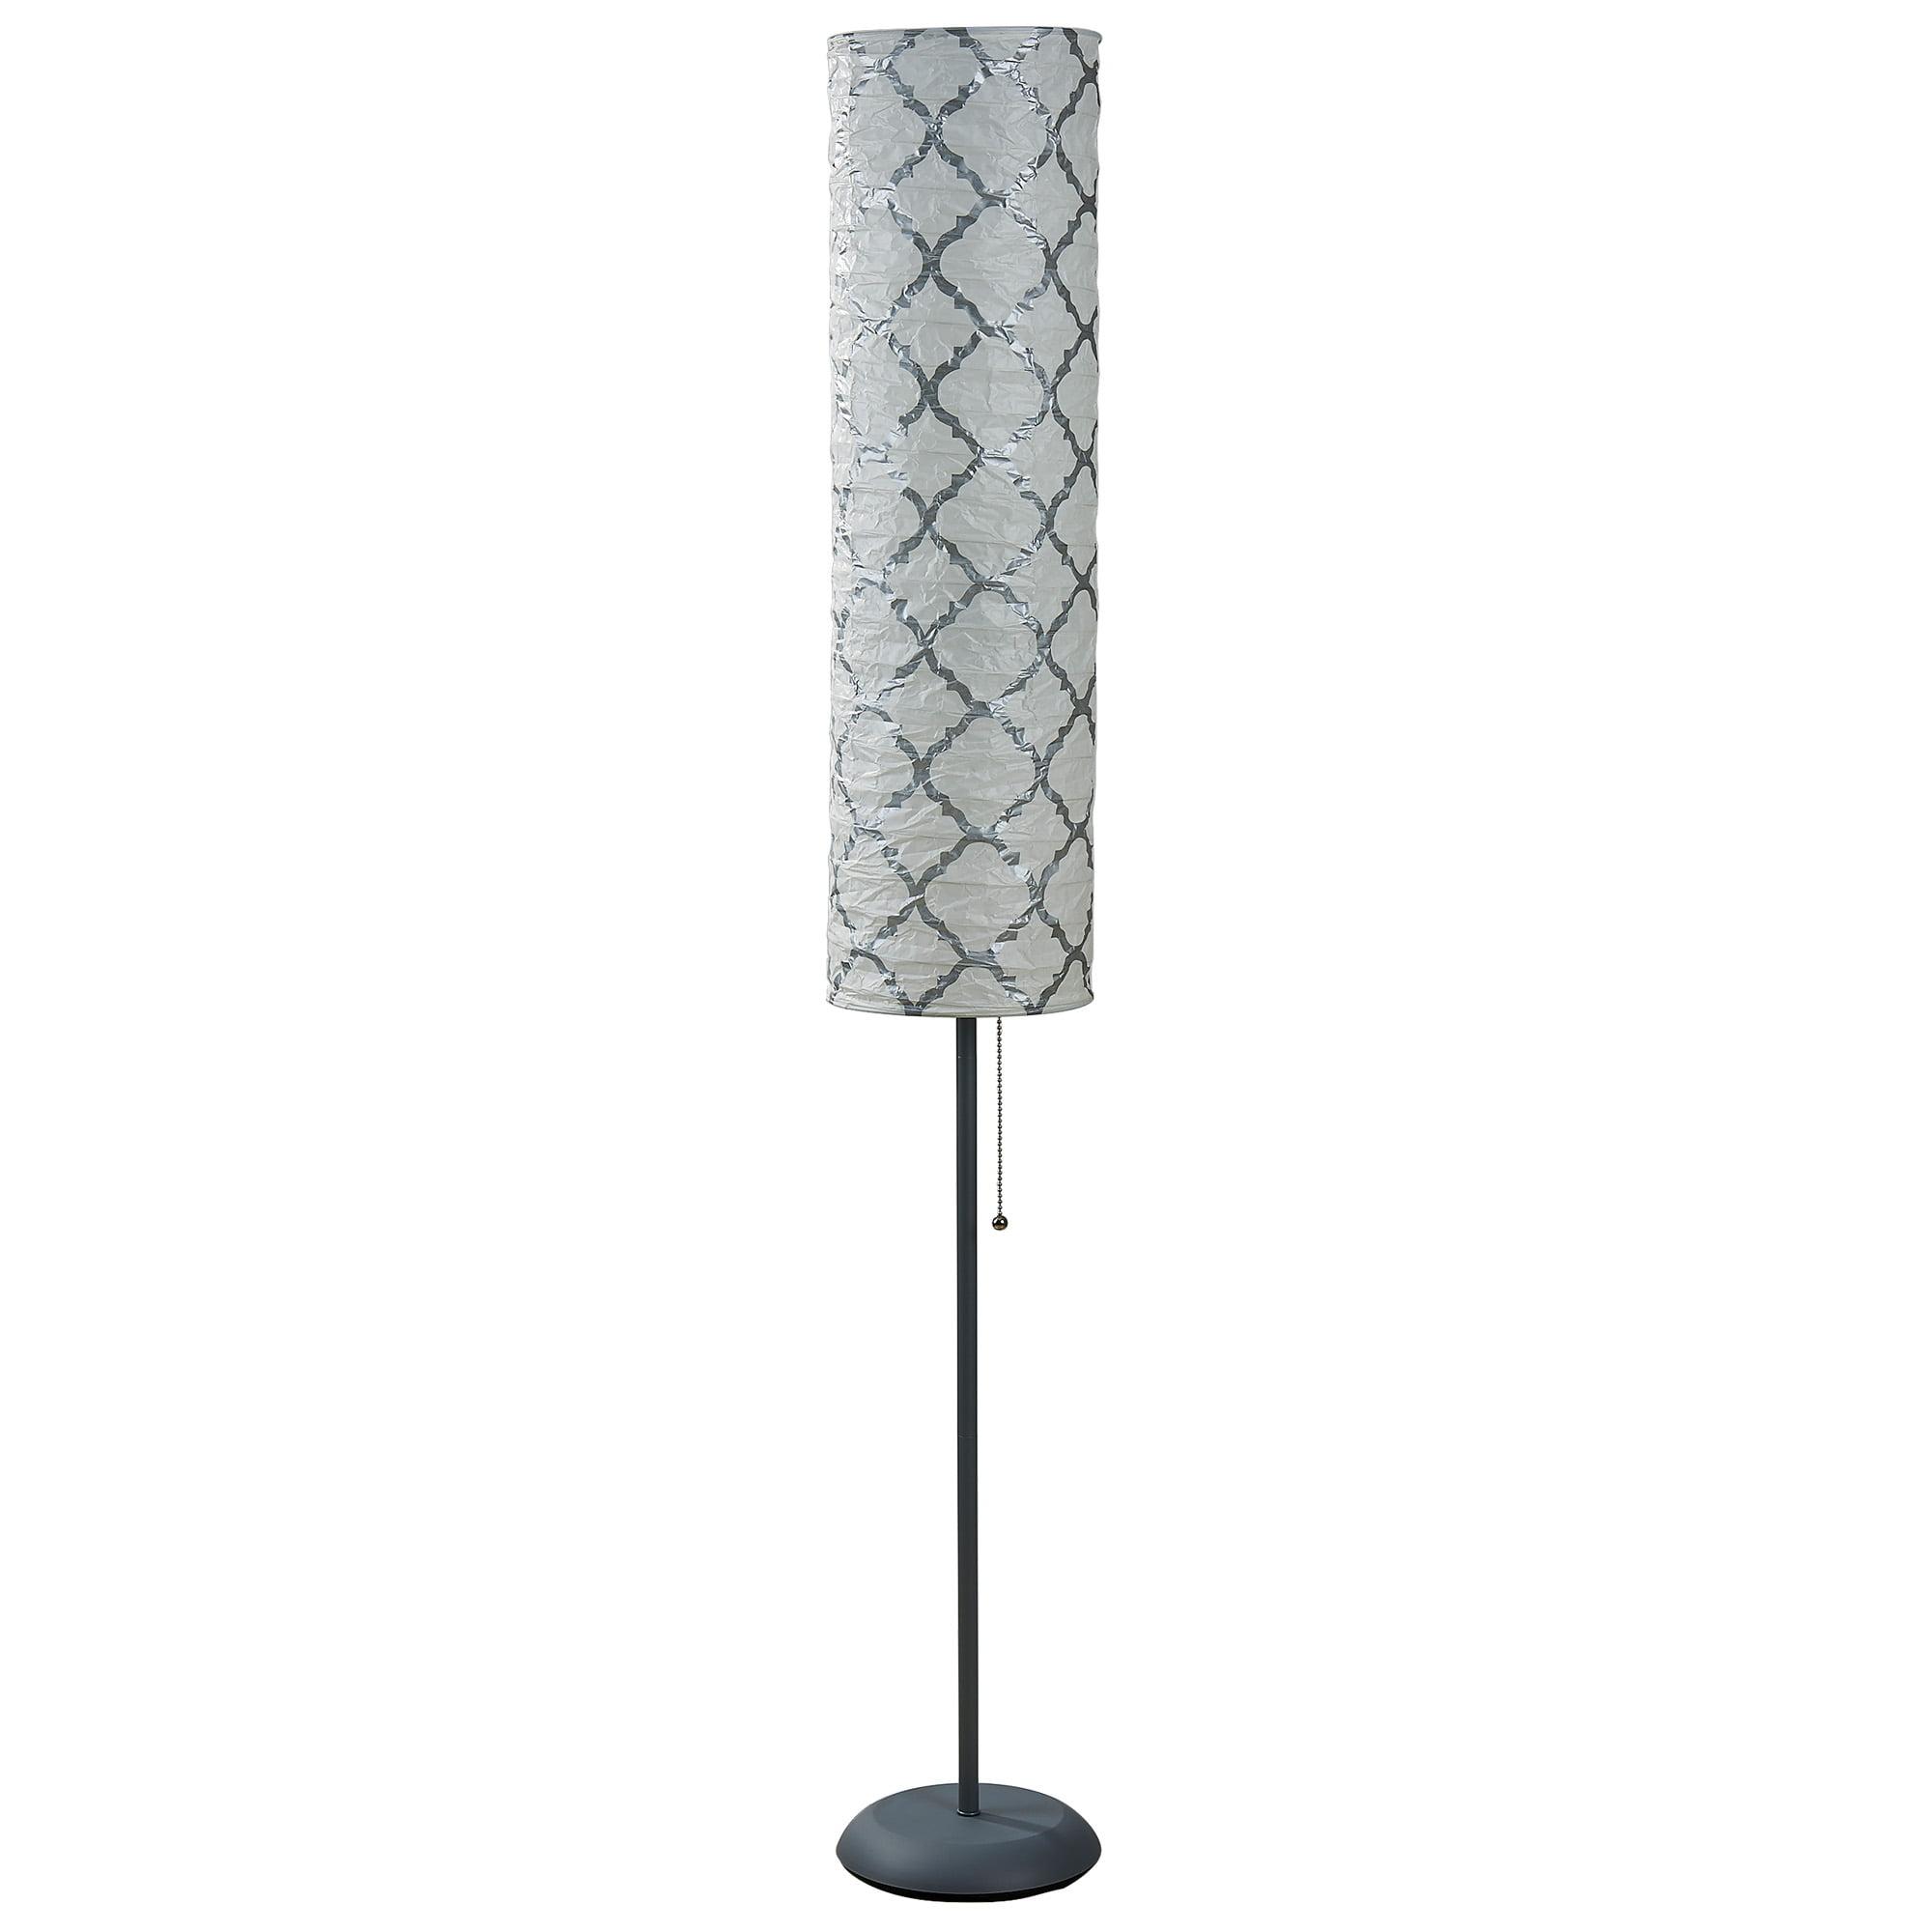 Mainstays 54 Quot Metallic Silver Rice Paper Shade Floor Lamp